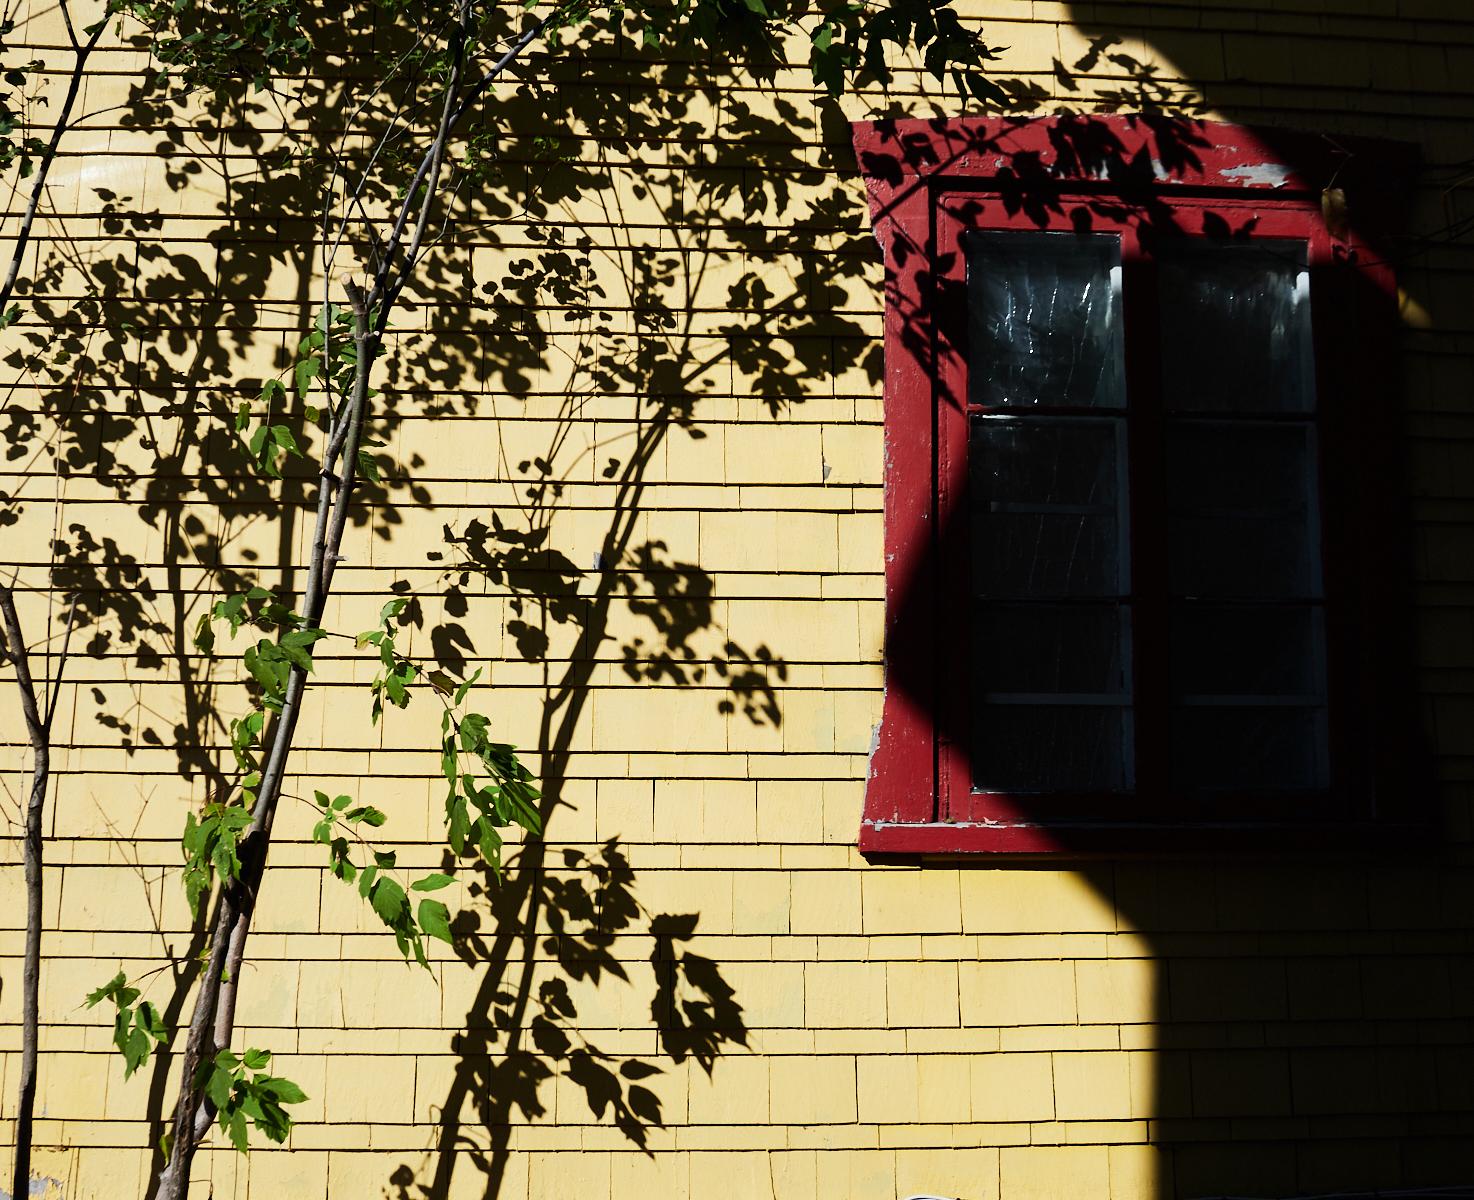 Baie St Paul1600x1200 sRGB 11 (2).jpg